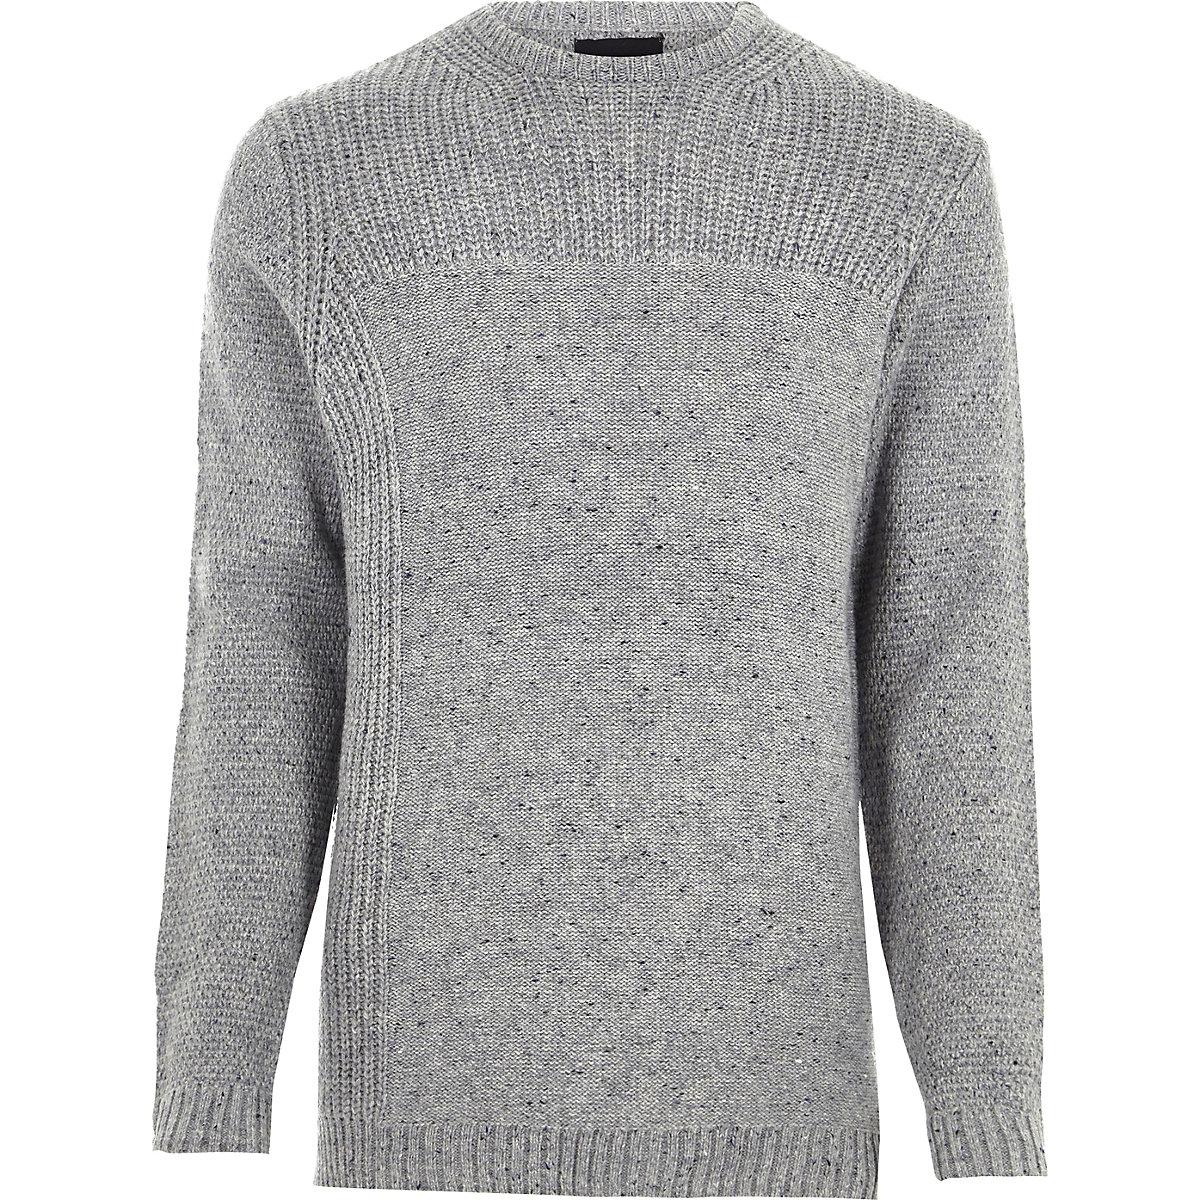 Grey mixed texture knit crew neck jumper